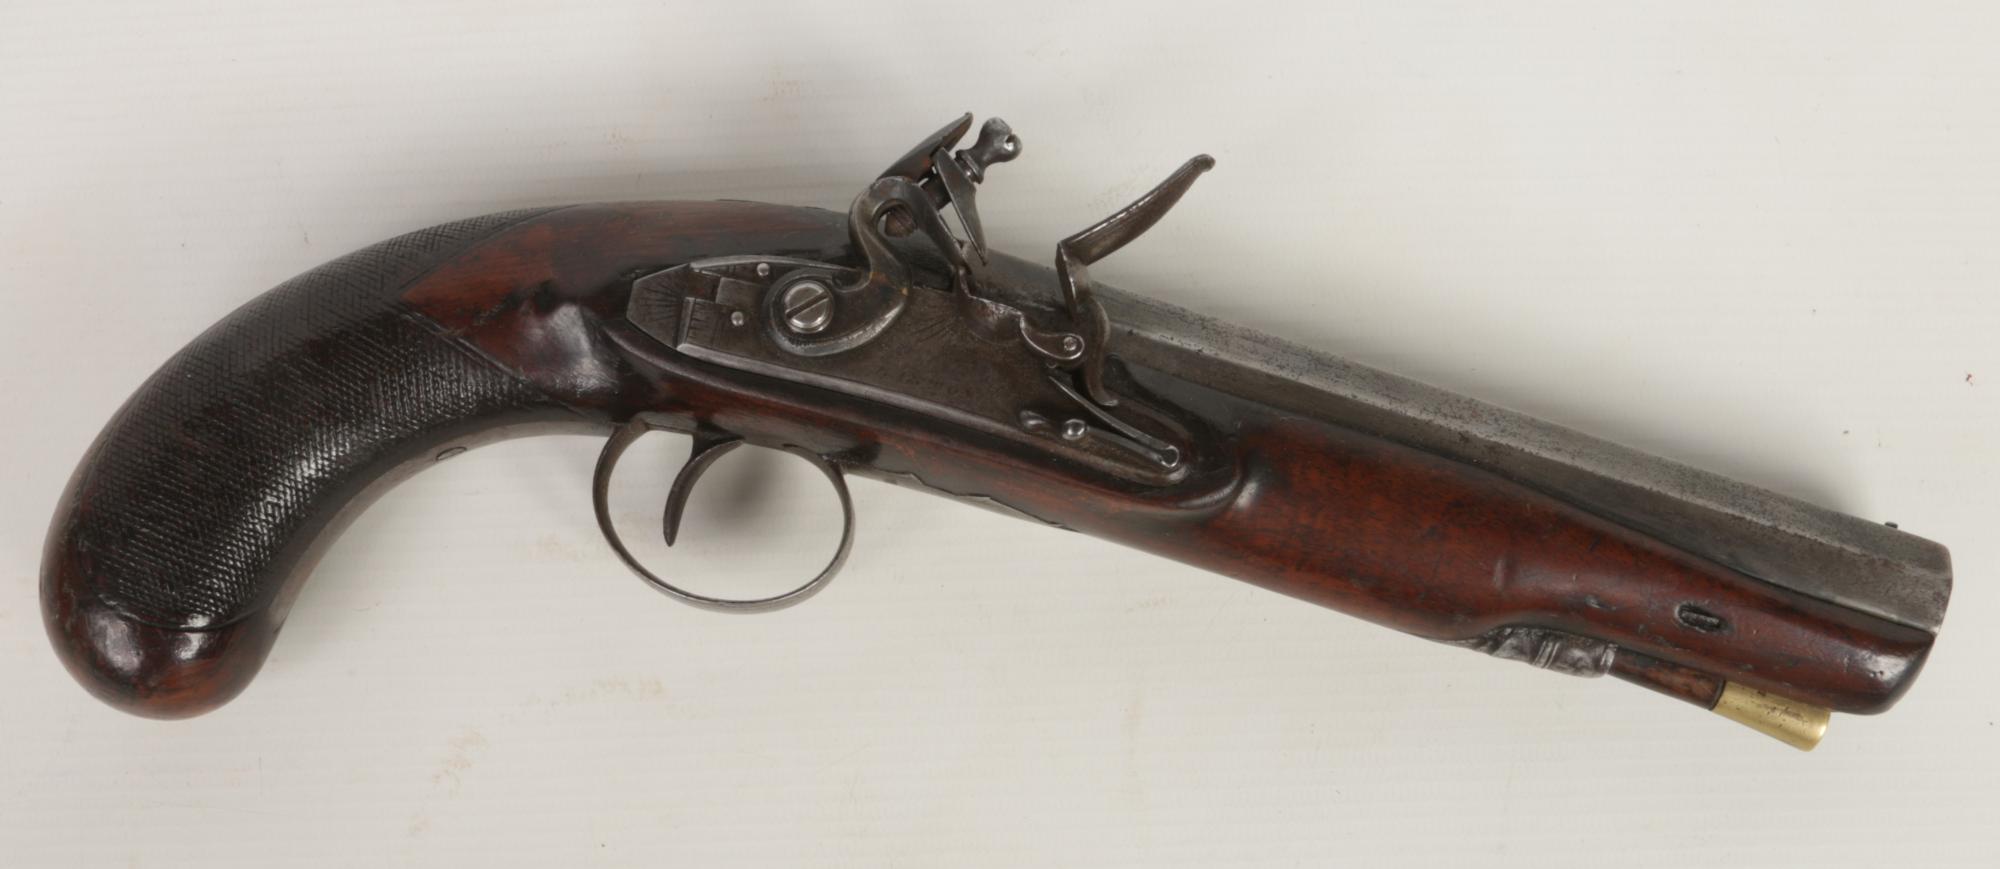 Lot 269 - A flintlock duelling pistol. With octagonal barrel, knurled walnut fullstock, ramrod and engraved